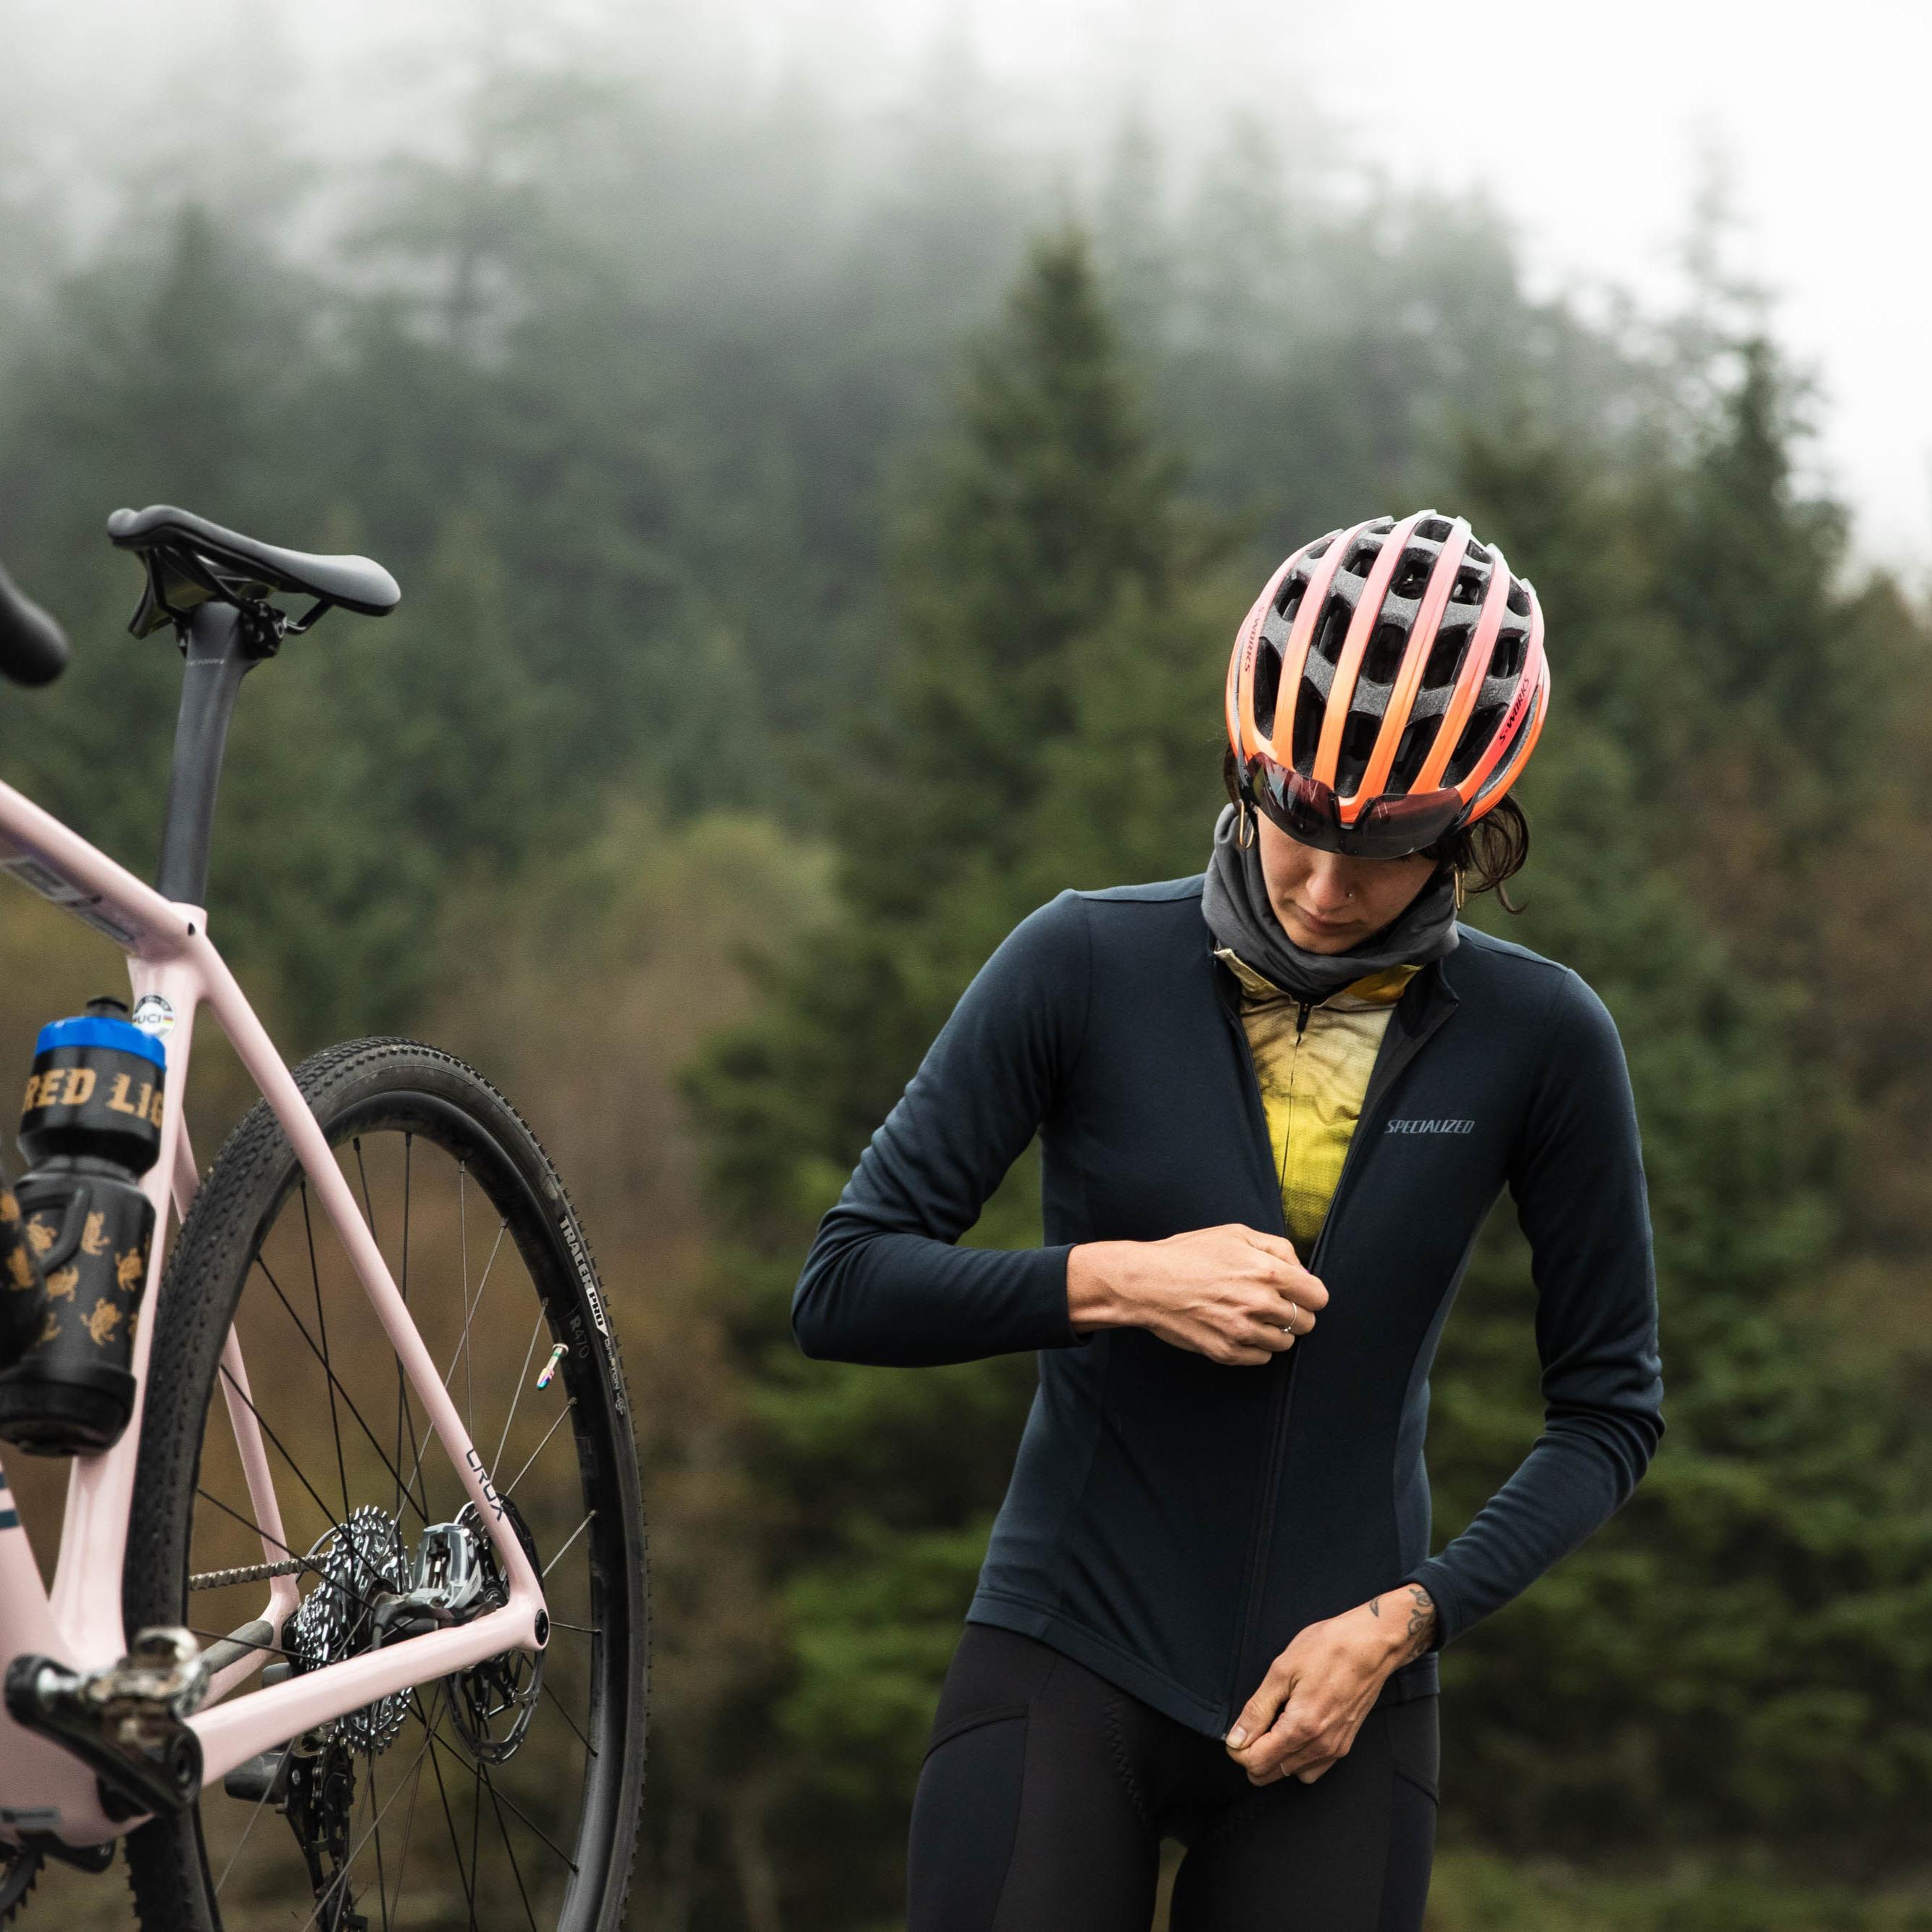 Rider wearing cycling apparel